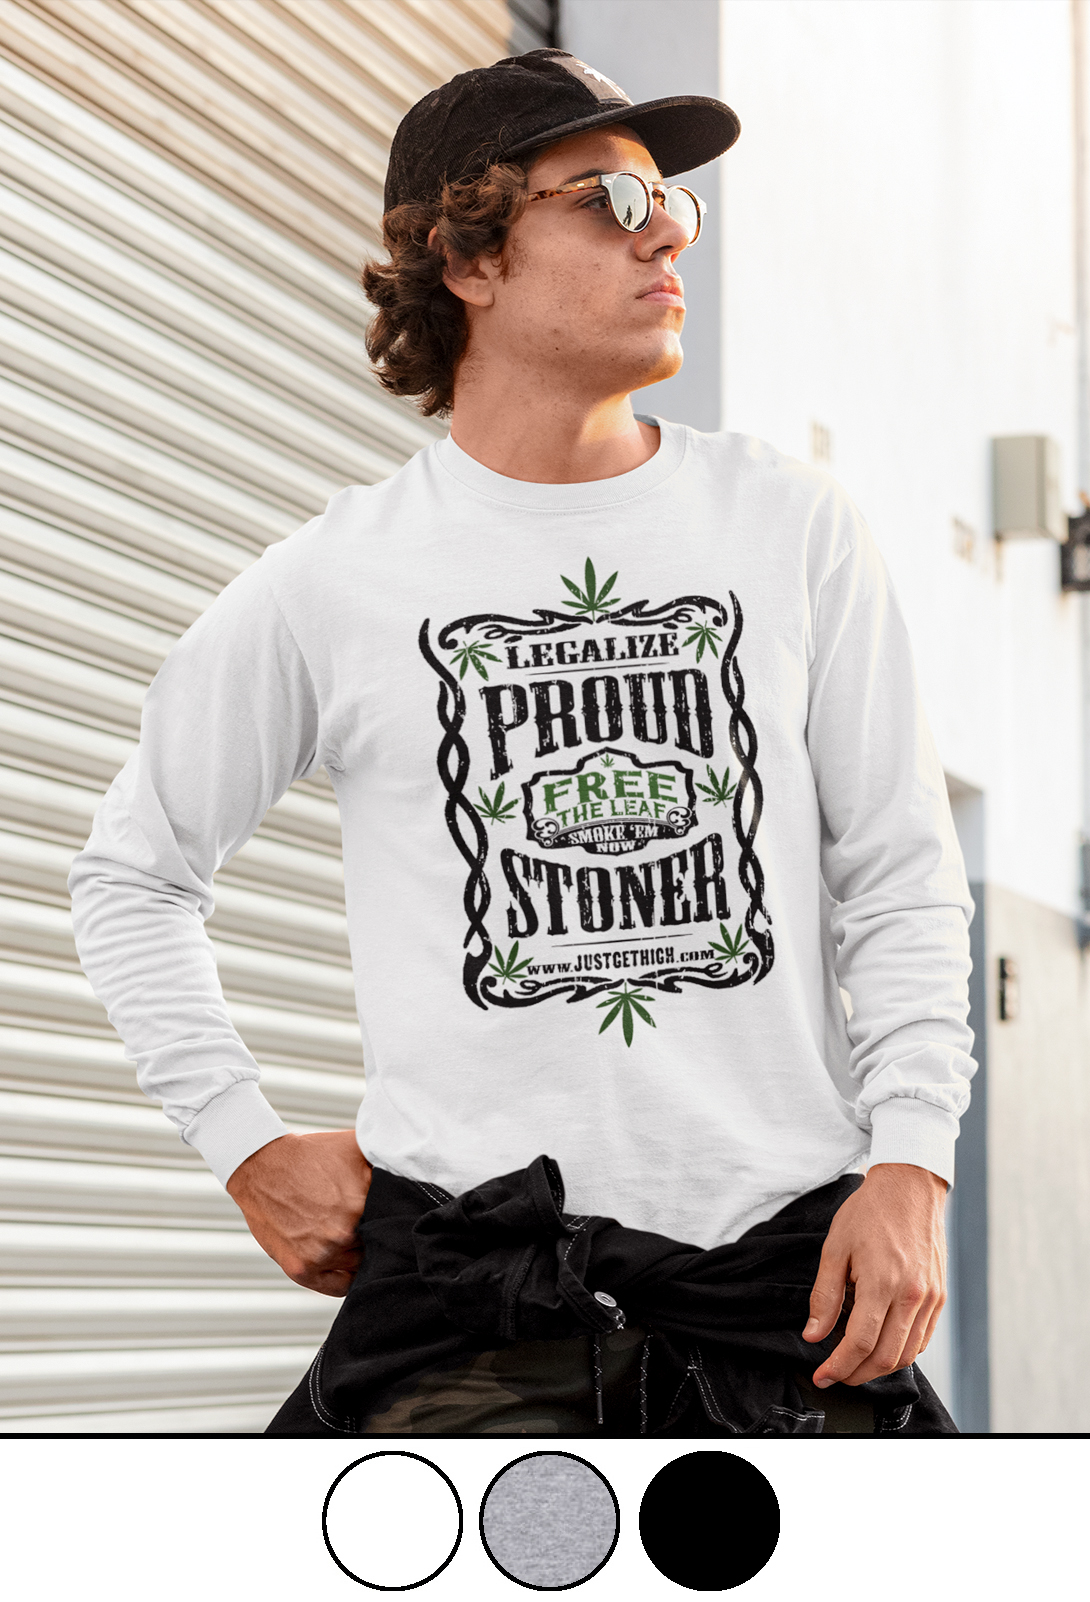 proud stoner_long sleeve shirt_model